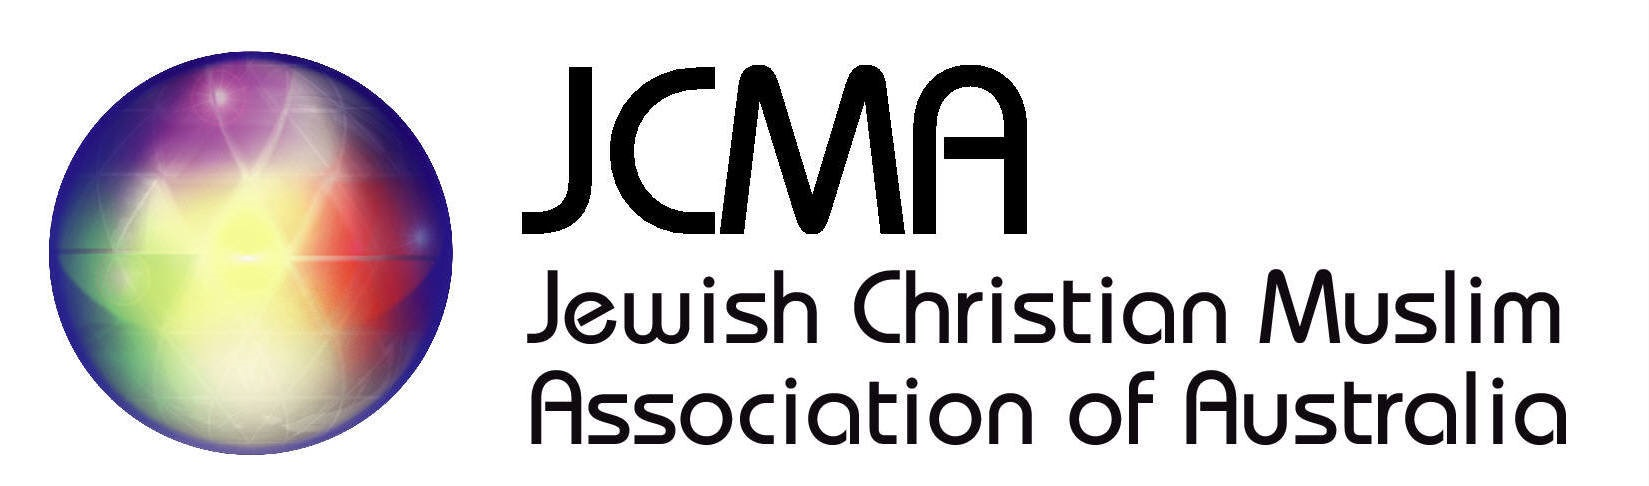 JCMA_Logo_left